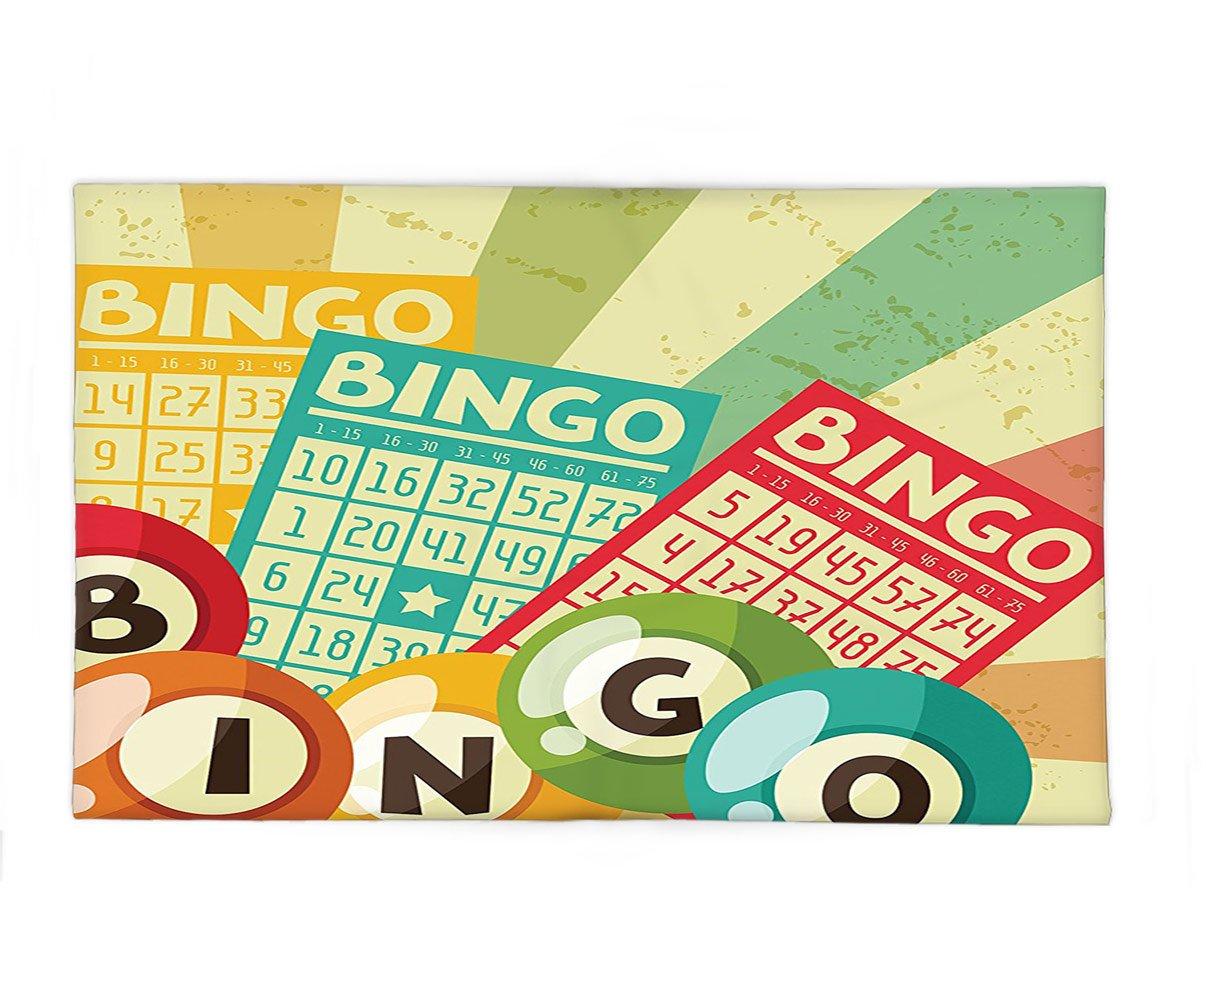 Interestlee Fleece Throw Blanket Vintage Decor Bingo Game with Ball and Cards Pop Art Stylized Lottery Hobby Celebration Theme Multi